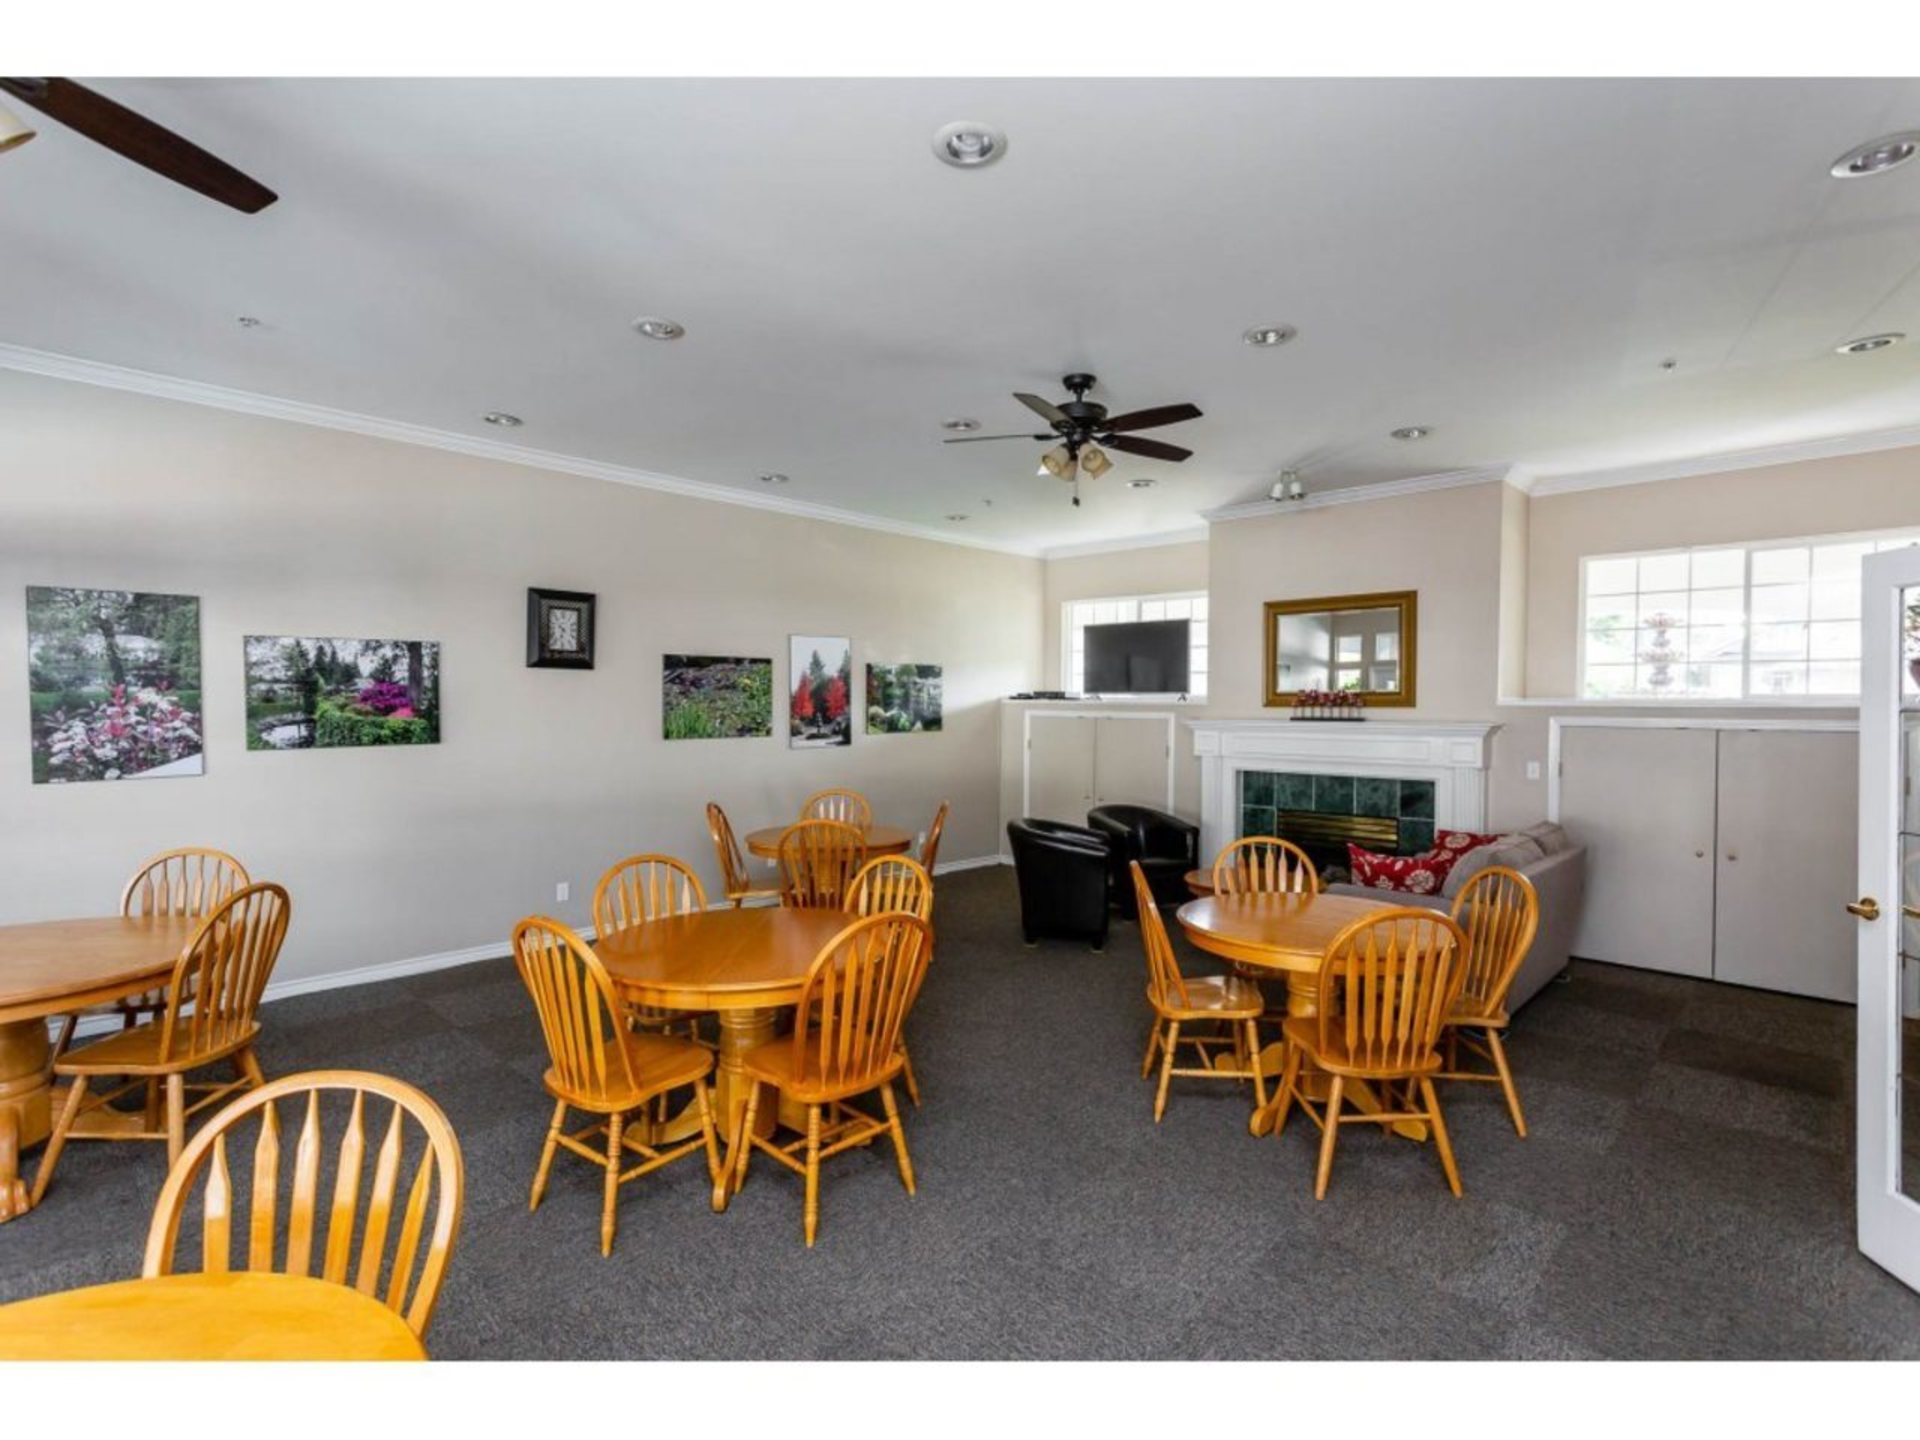 20655-88-avenue-walnut-grove-langley-17 at 330 - 20655 88 Avenue, Walnut Grove, Langley